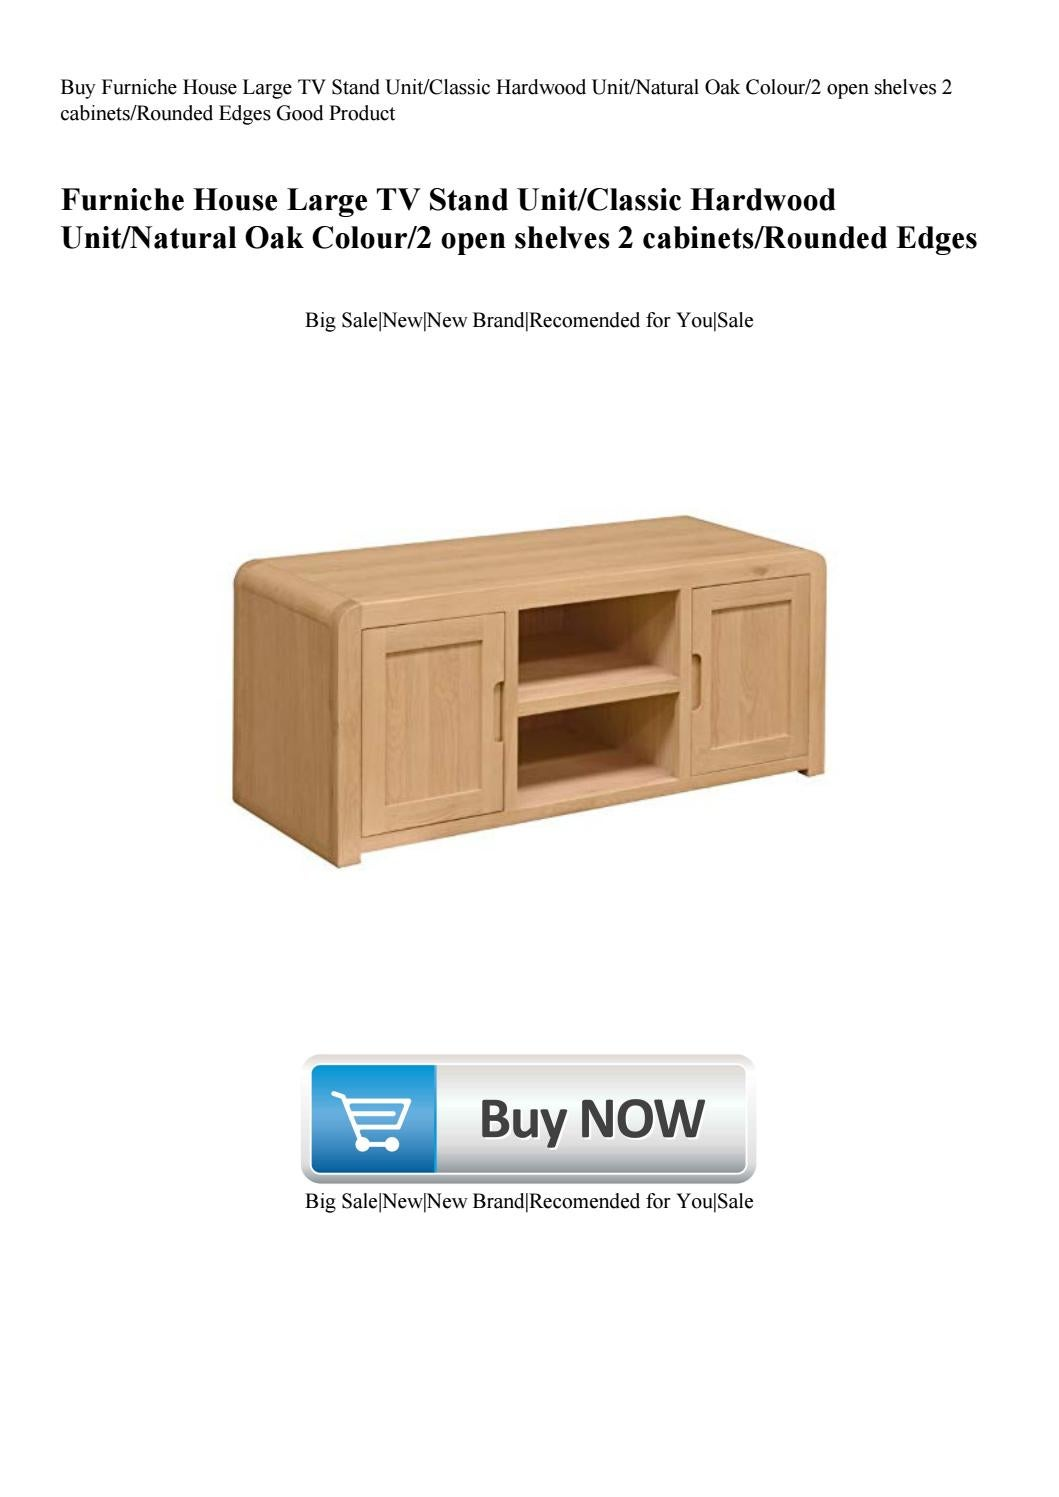 Buy Furniche House Large TV Stand UnitClassic Hardwood